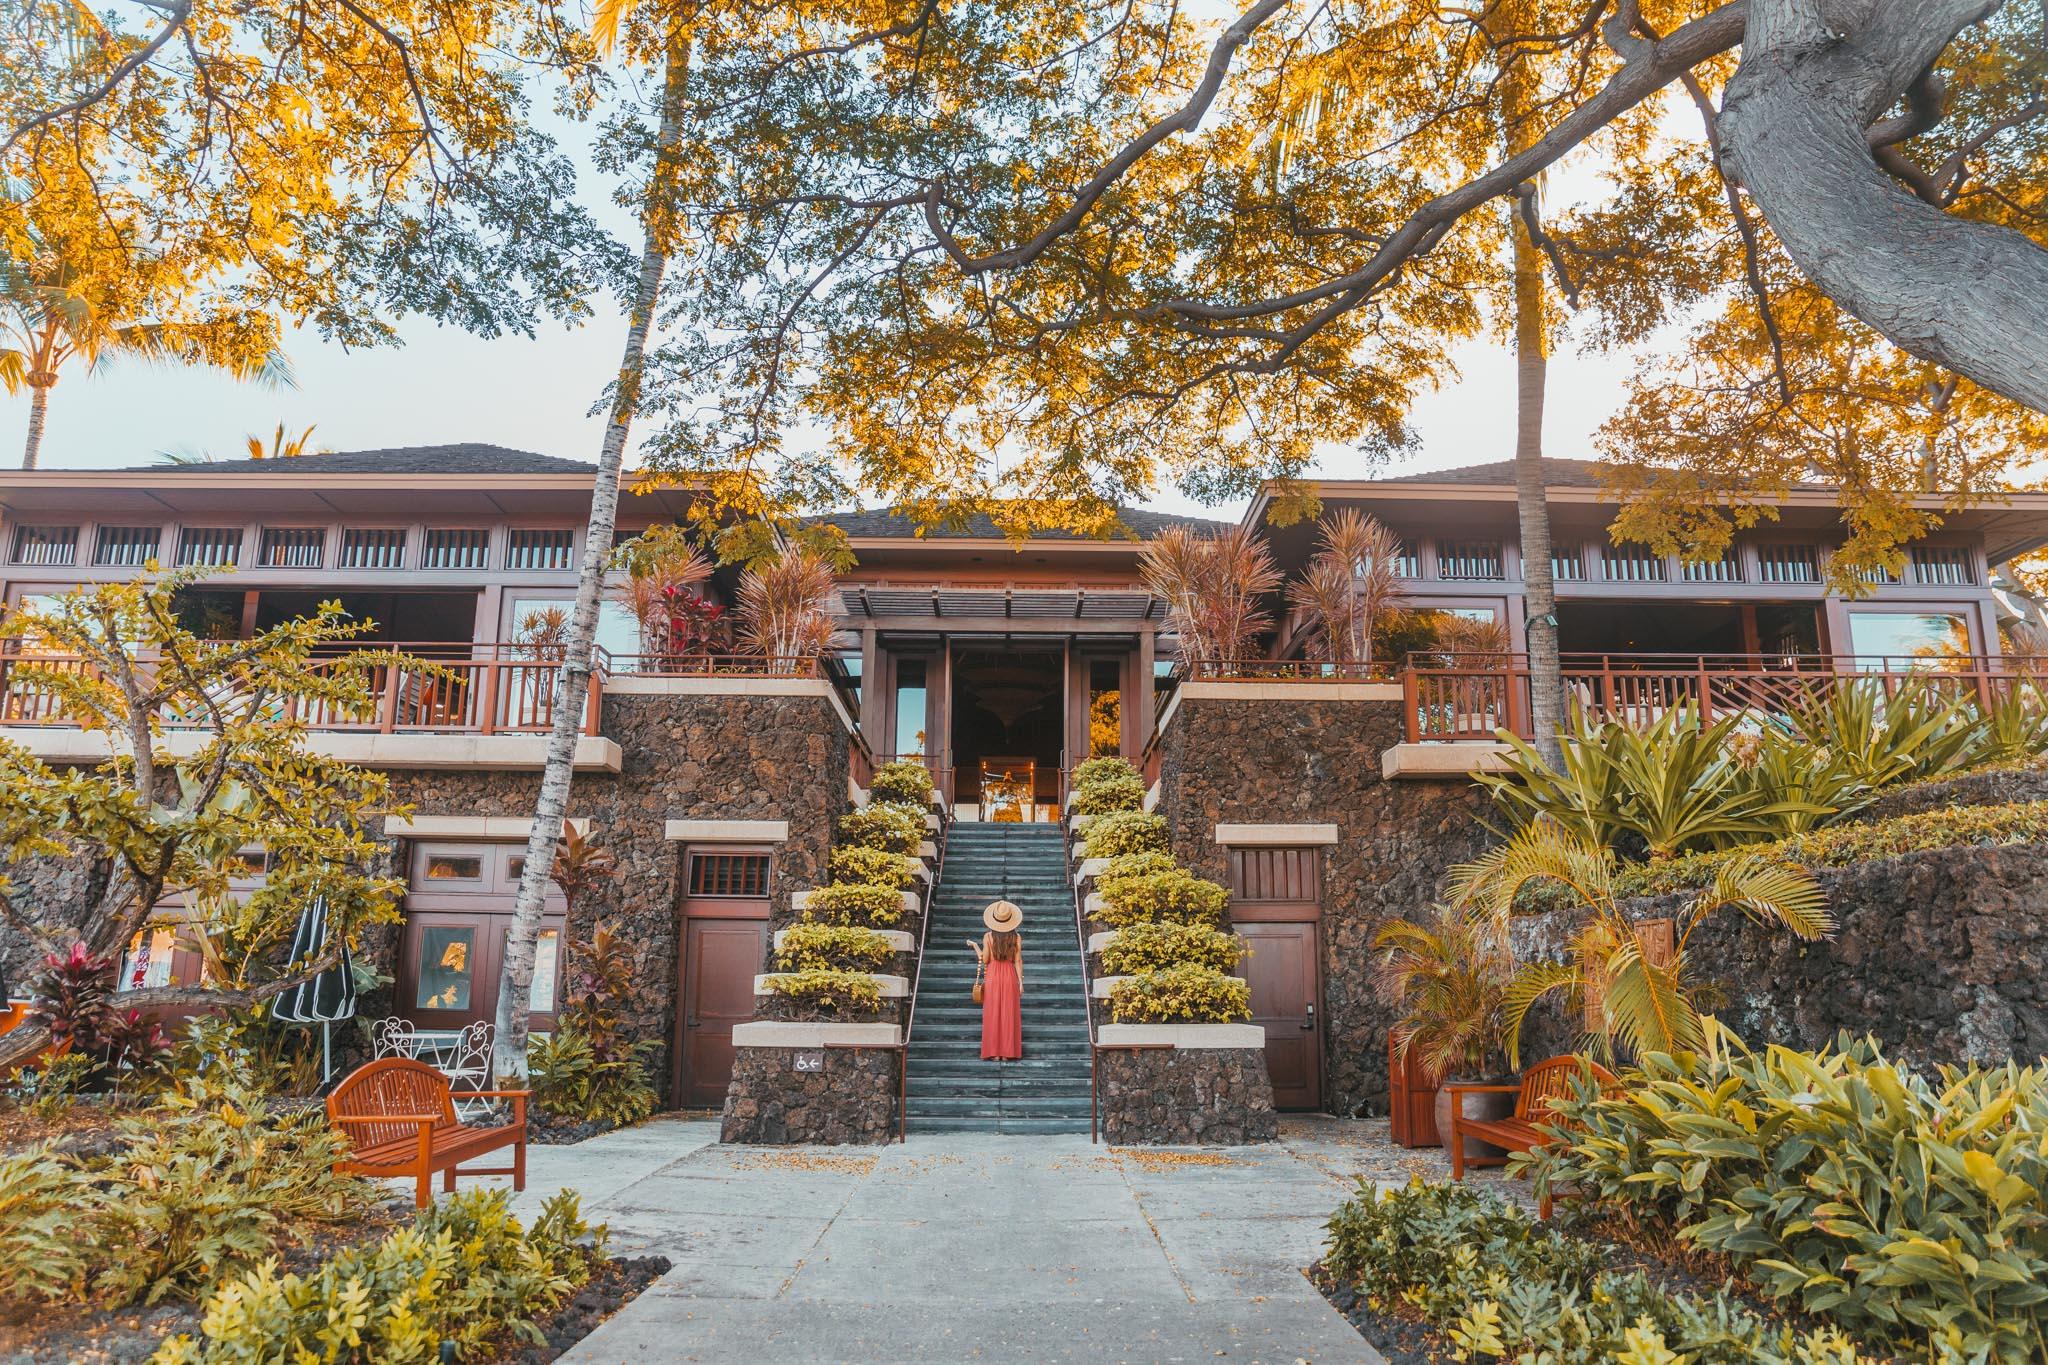 The lobby // A Luxury Stay on the Big Island: Four Seasons Resort Hualalai // #readysetjetset #hawaii #bigisland #luxuryhotels #beachresorts #usa #travel